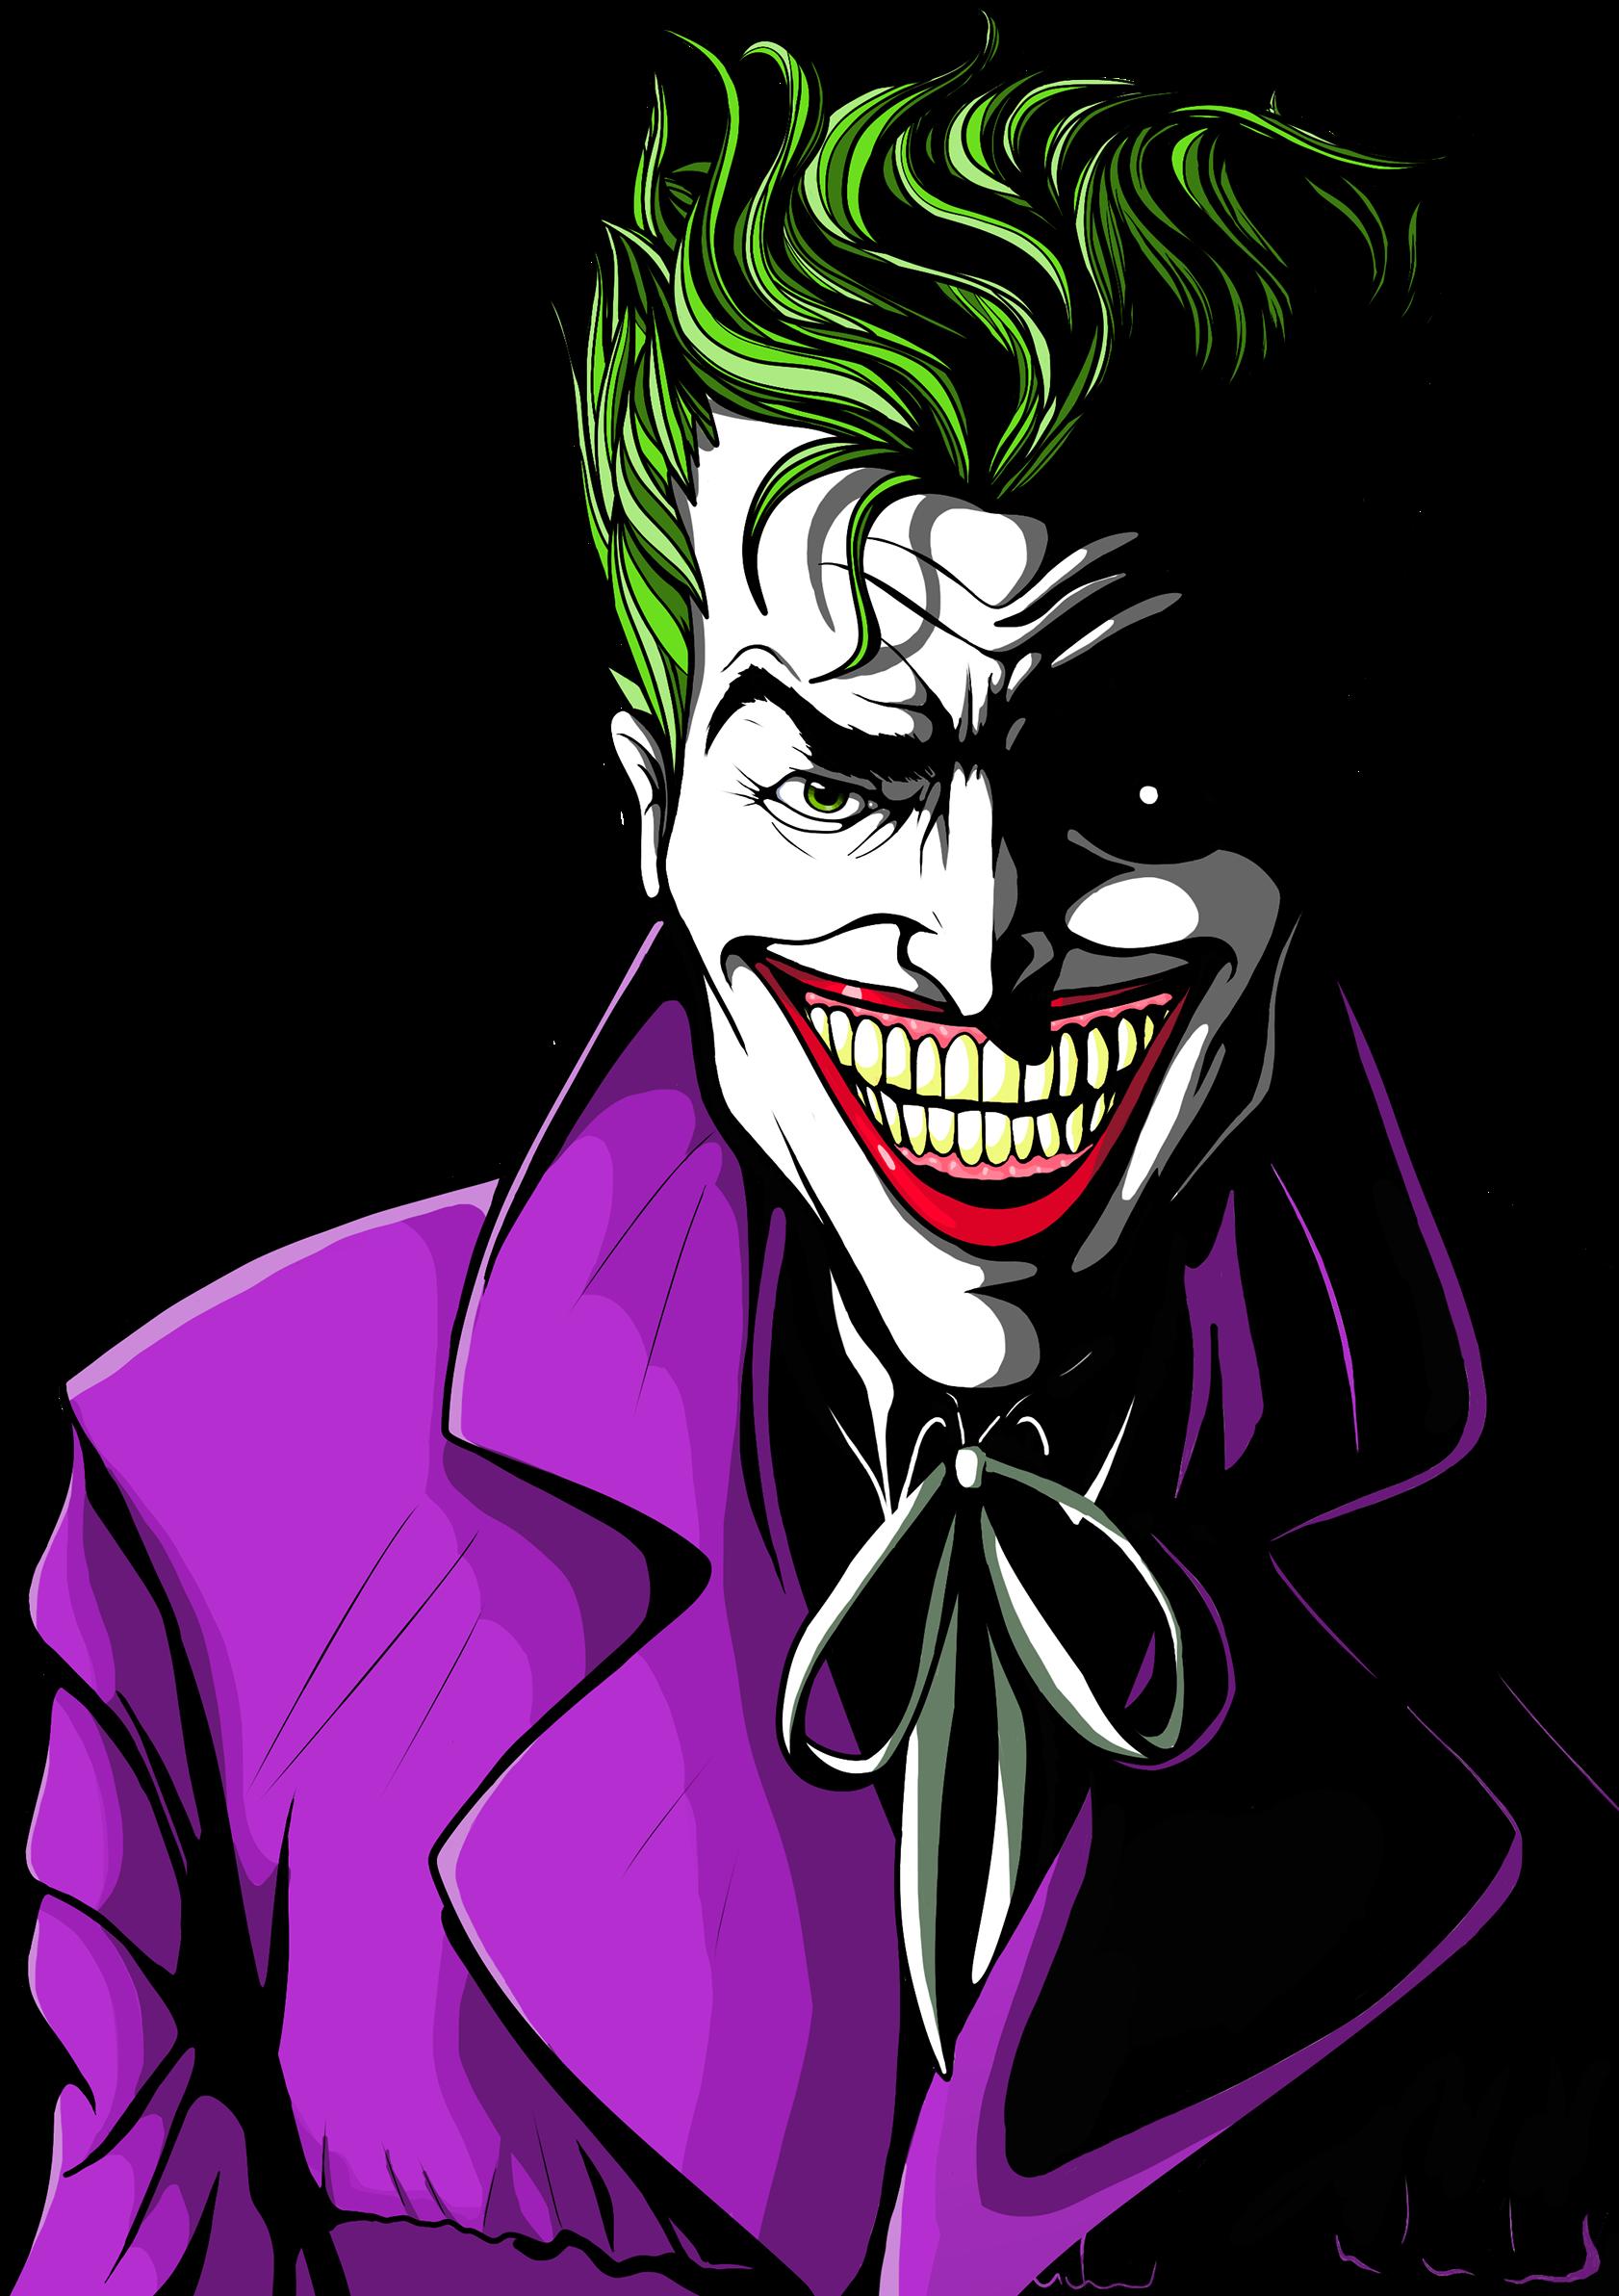 Thank You Joker Batman The Killing Joke Full Size Png Download Seekpng